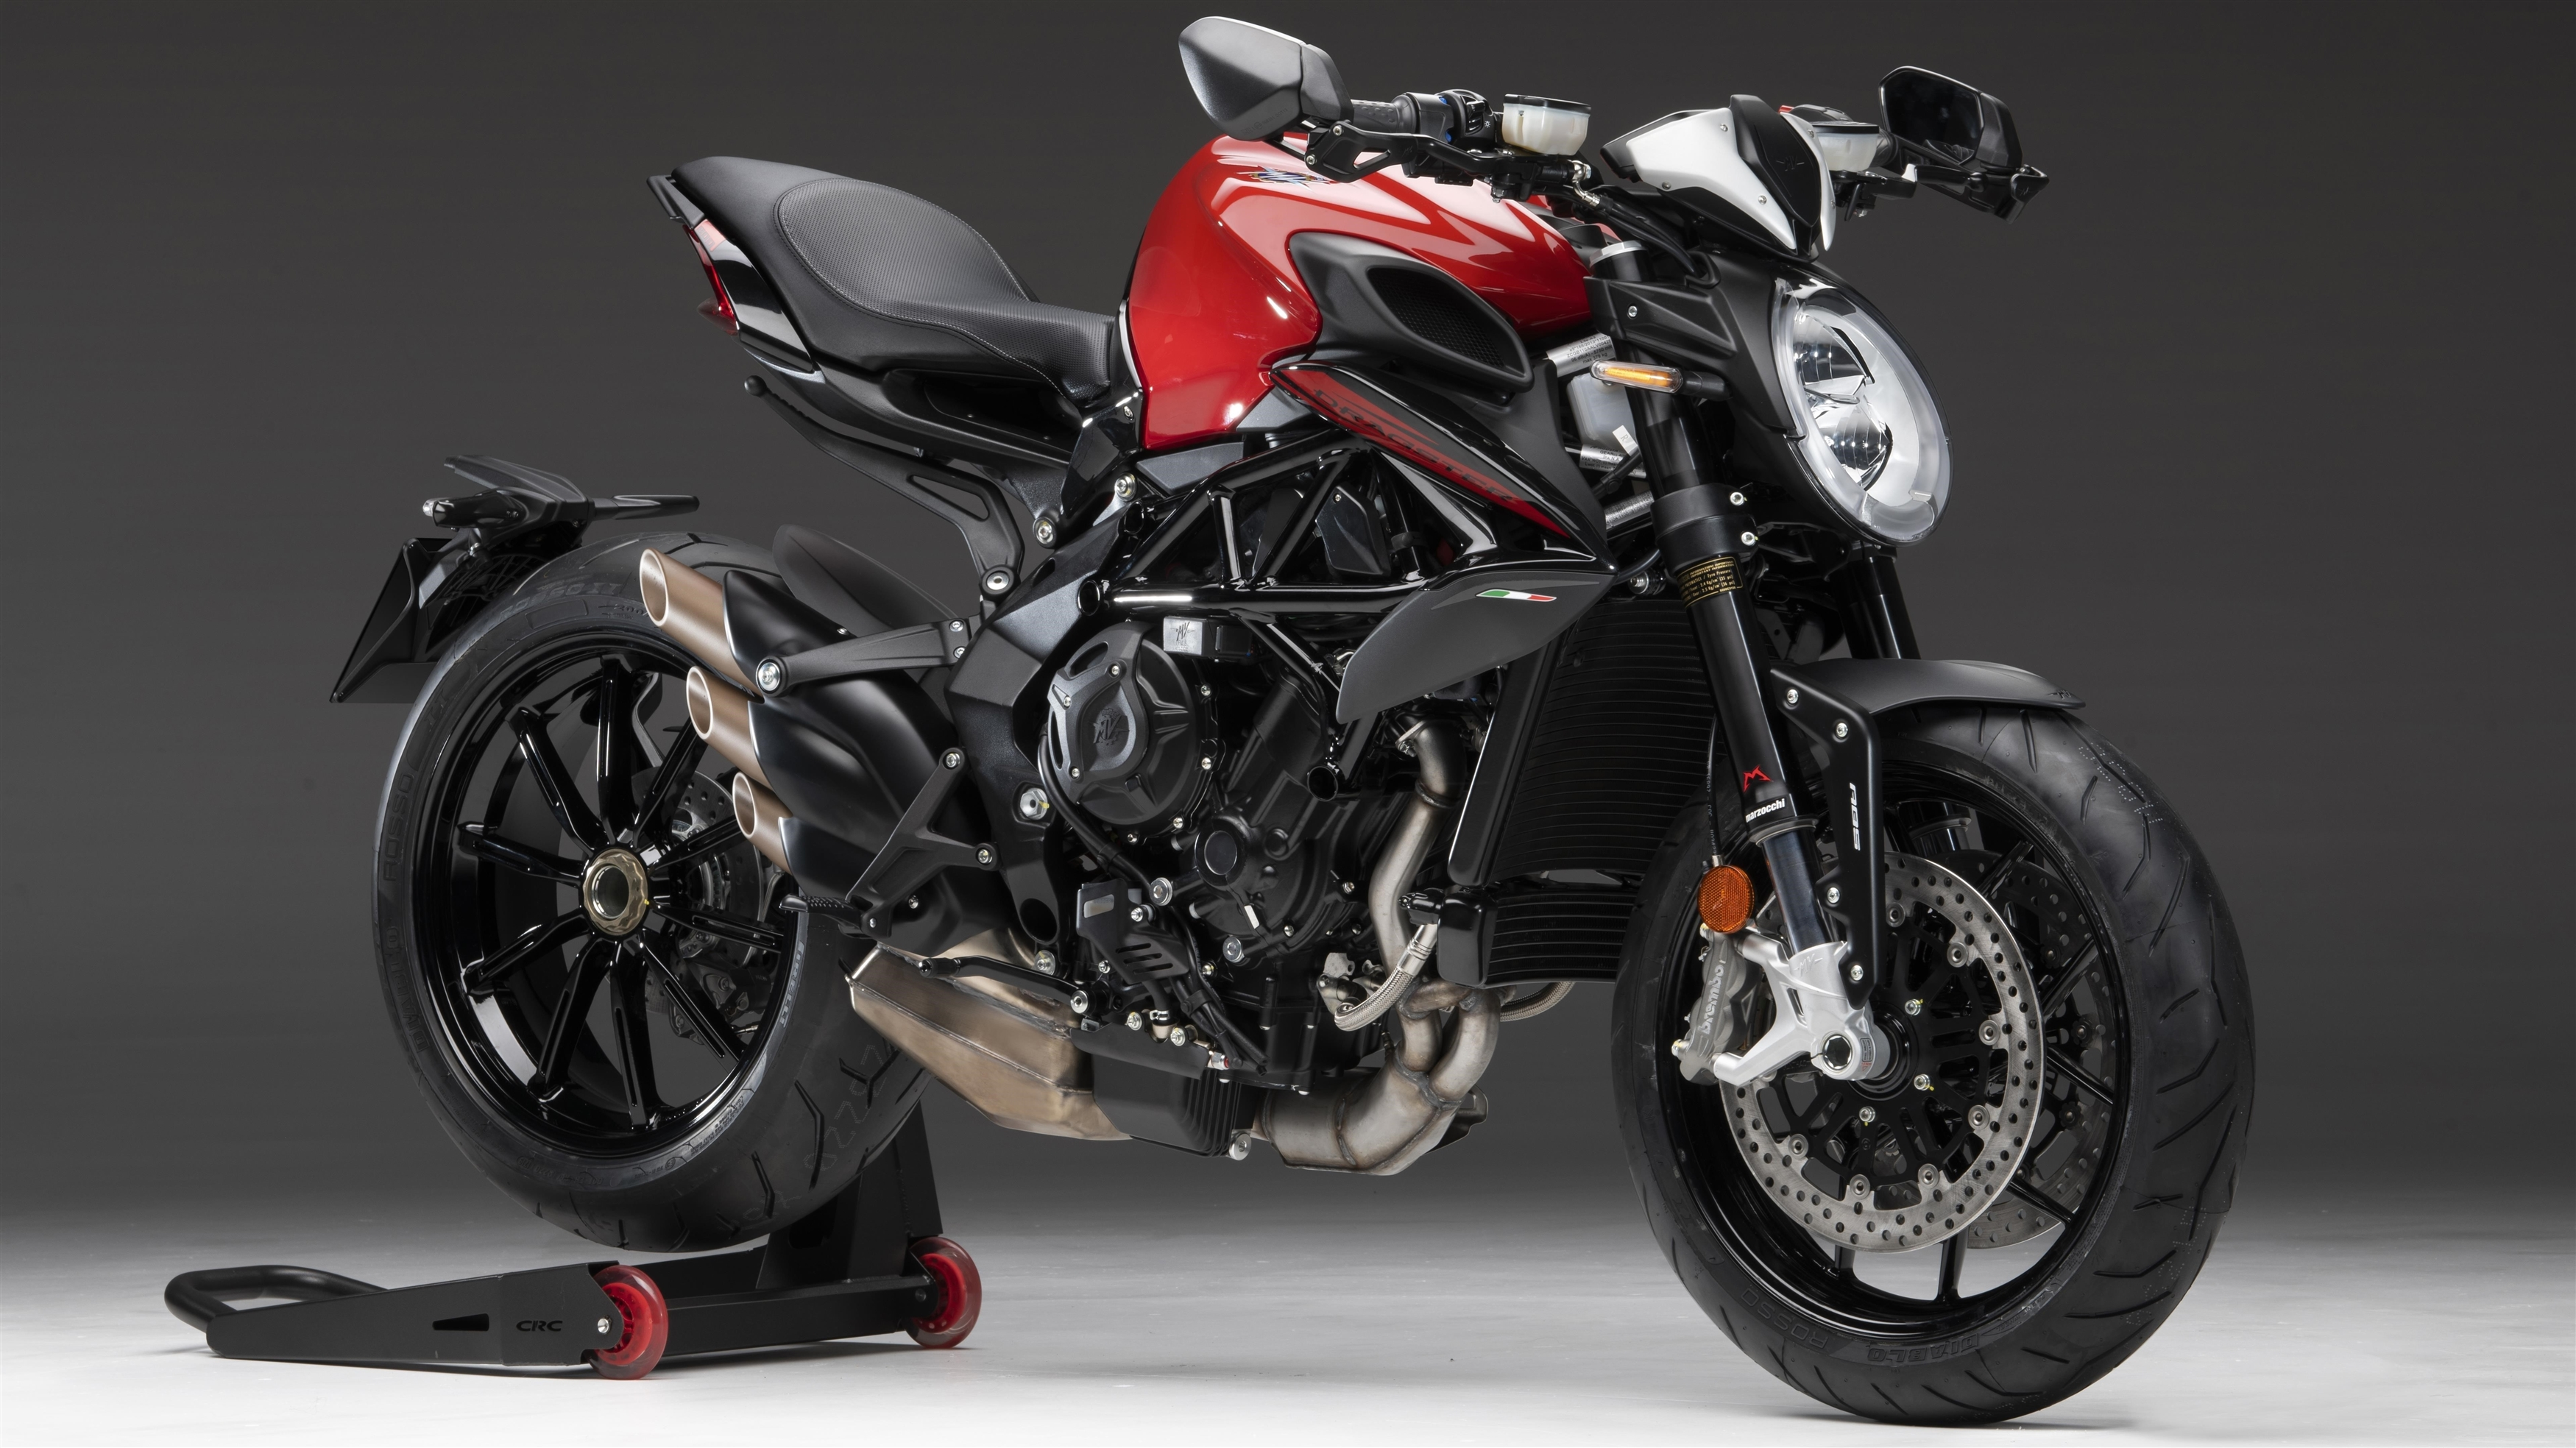 Mv agusta dragster 800 rosso 2020 обои скачать